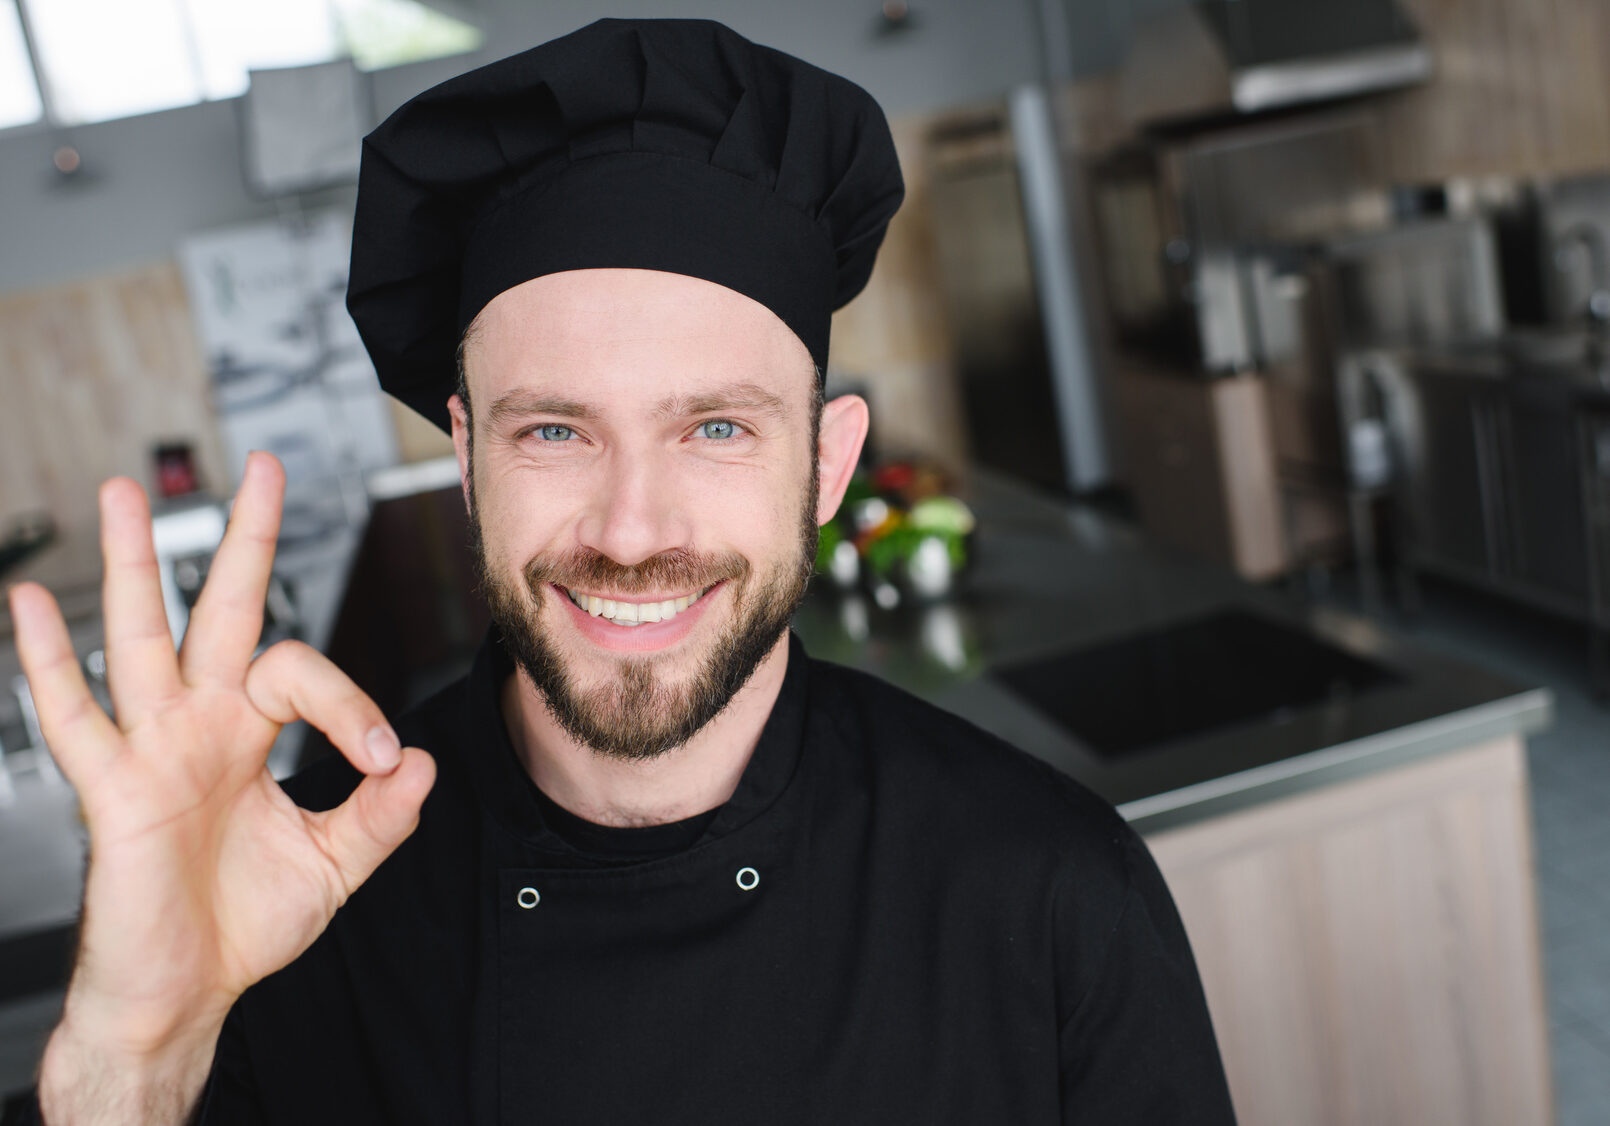 smiling handsome chef showing okay gesture at restaurant kitchen